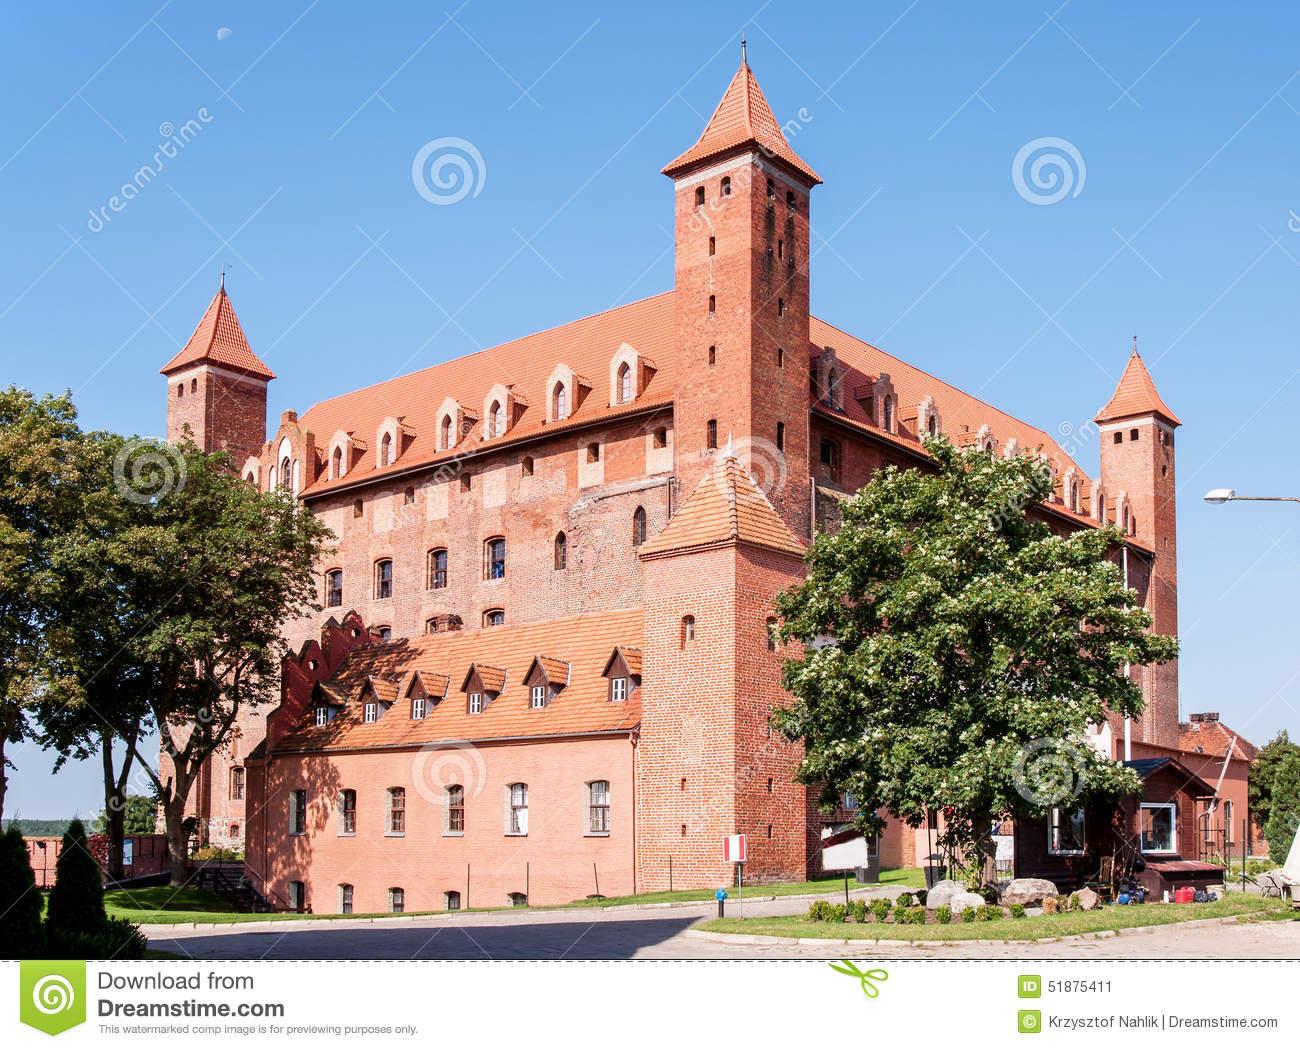 Castle Of Teutonic Knights Order In Malbork, Poland Stock Photo.